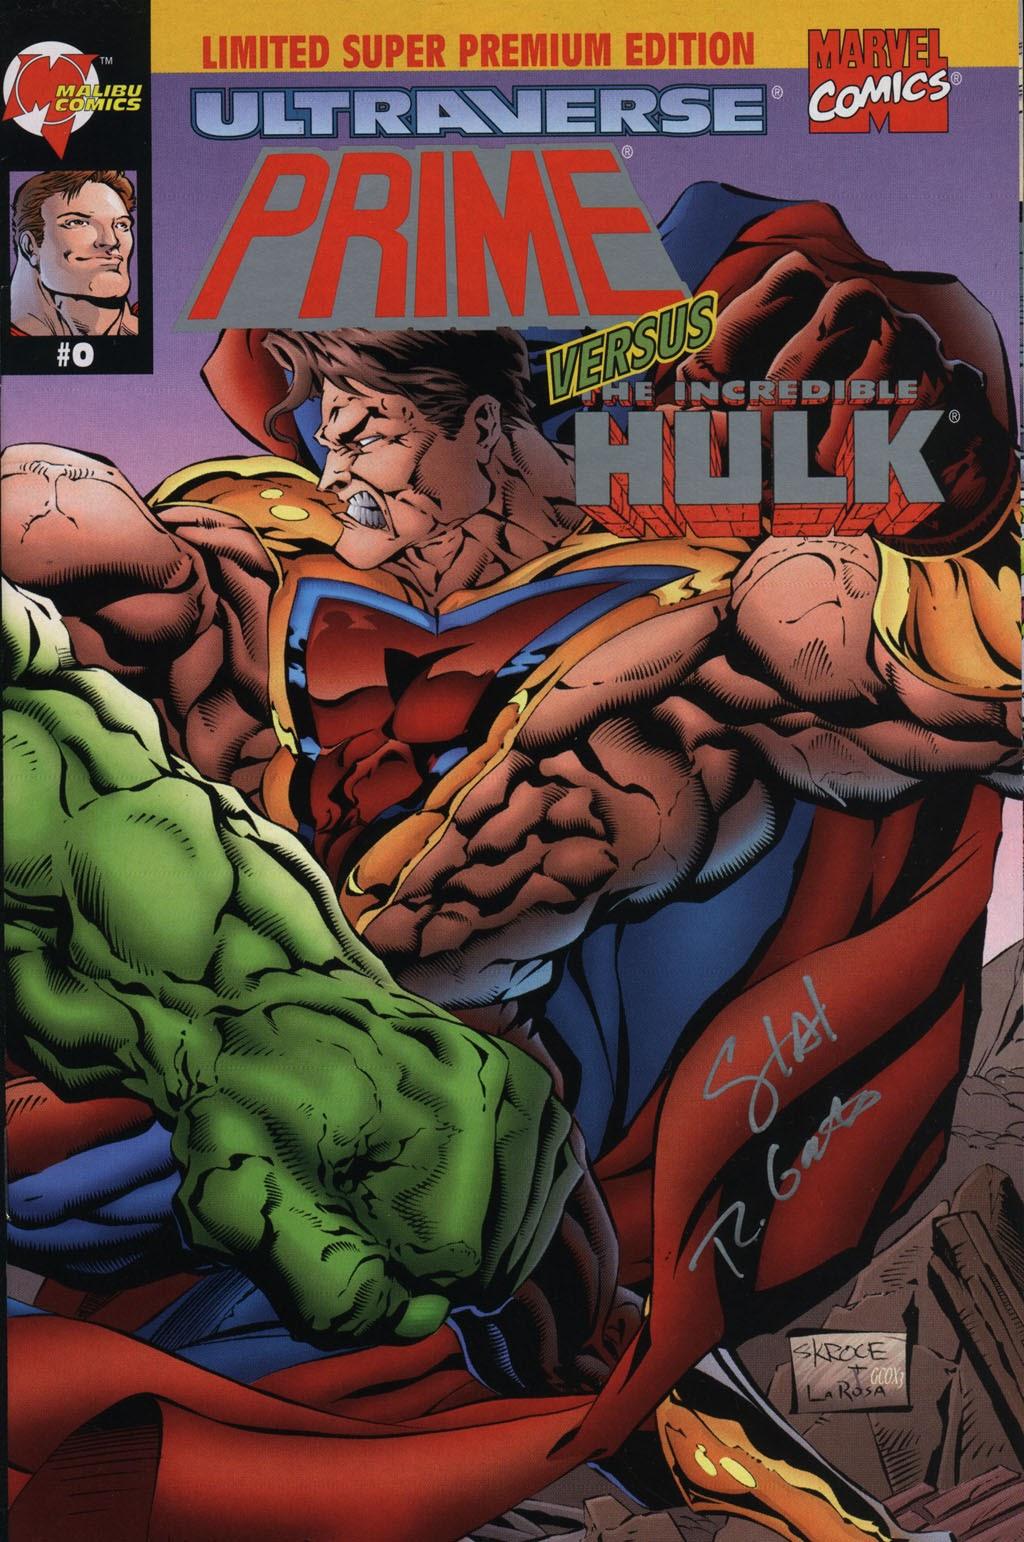 Read online Prime Vs. The Incredible Hulk comic -  Issue # Full - 2